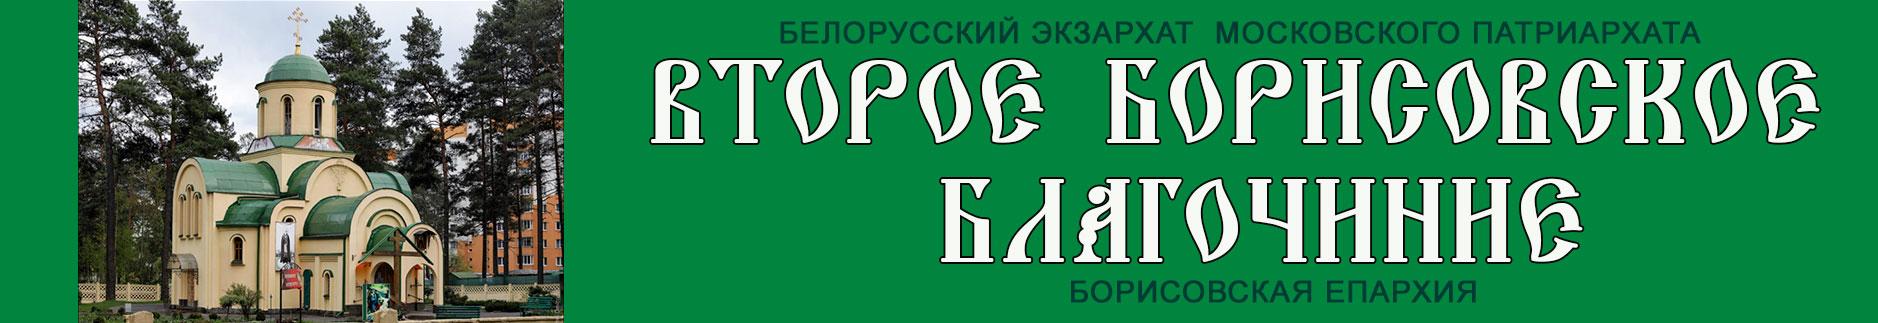 Сайт Второго Борисовского благочиния